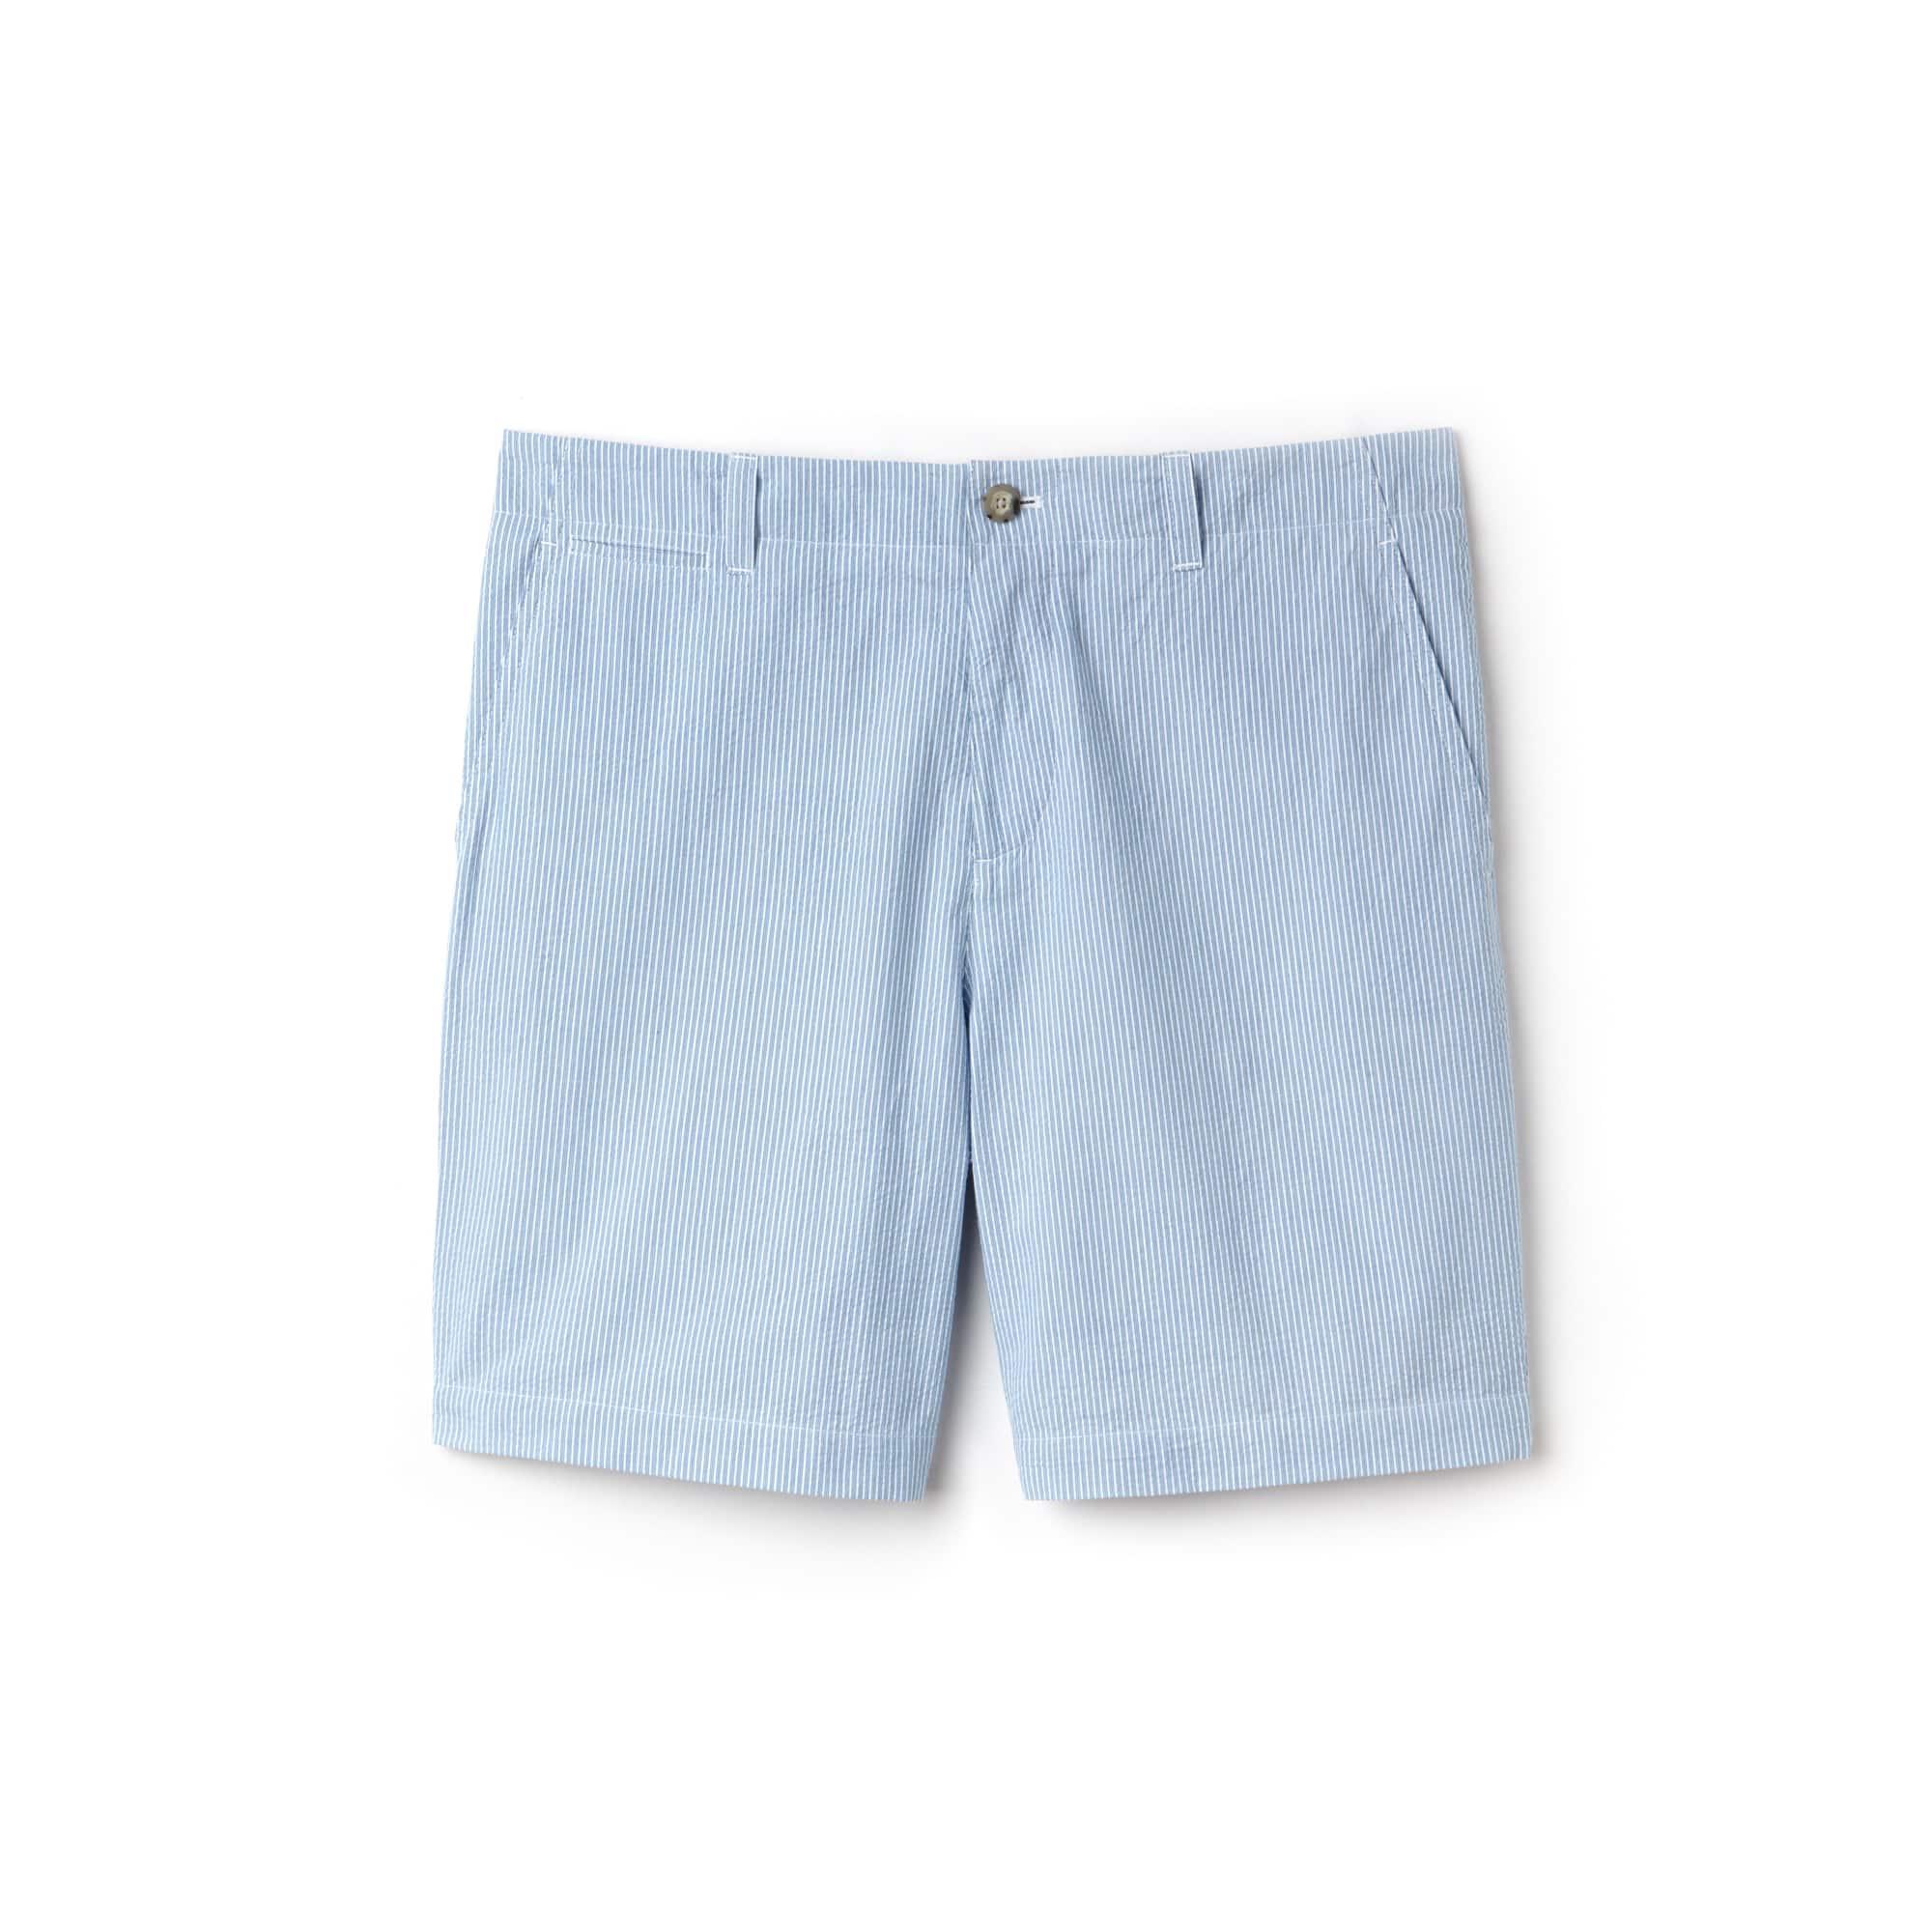 Men's Regular Fit Striped Cotton Seersucker Bermuda Shorts